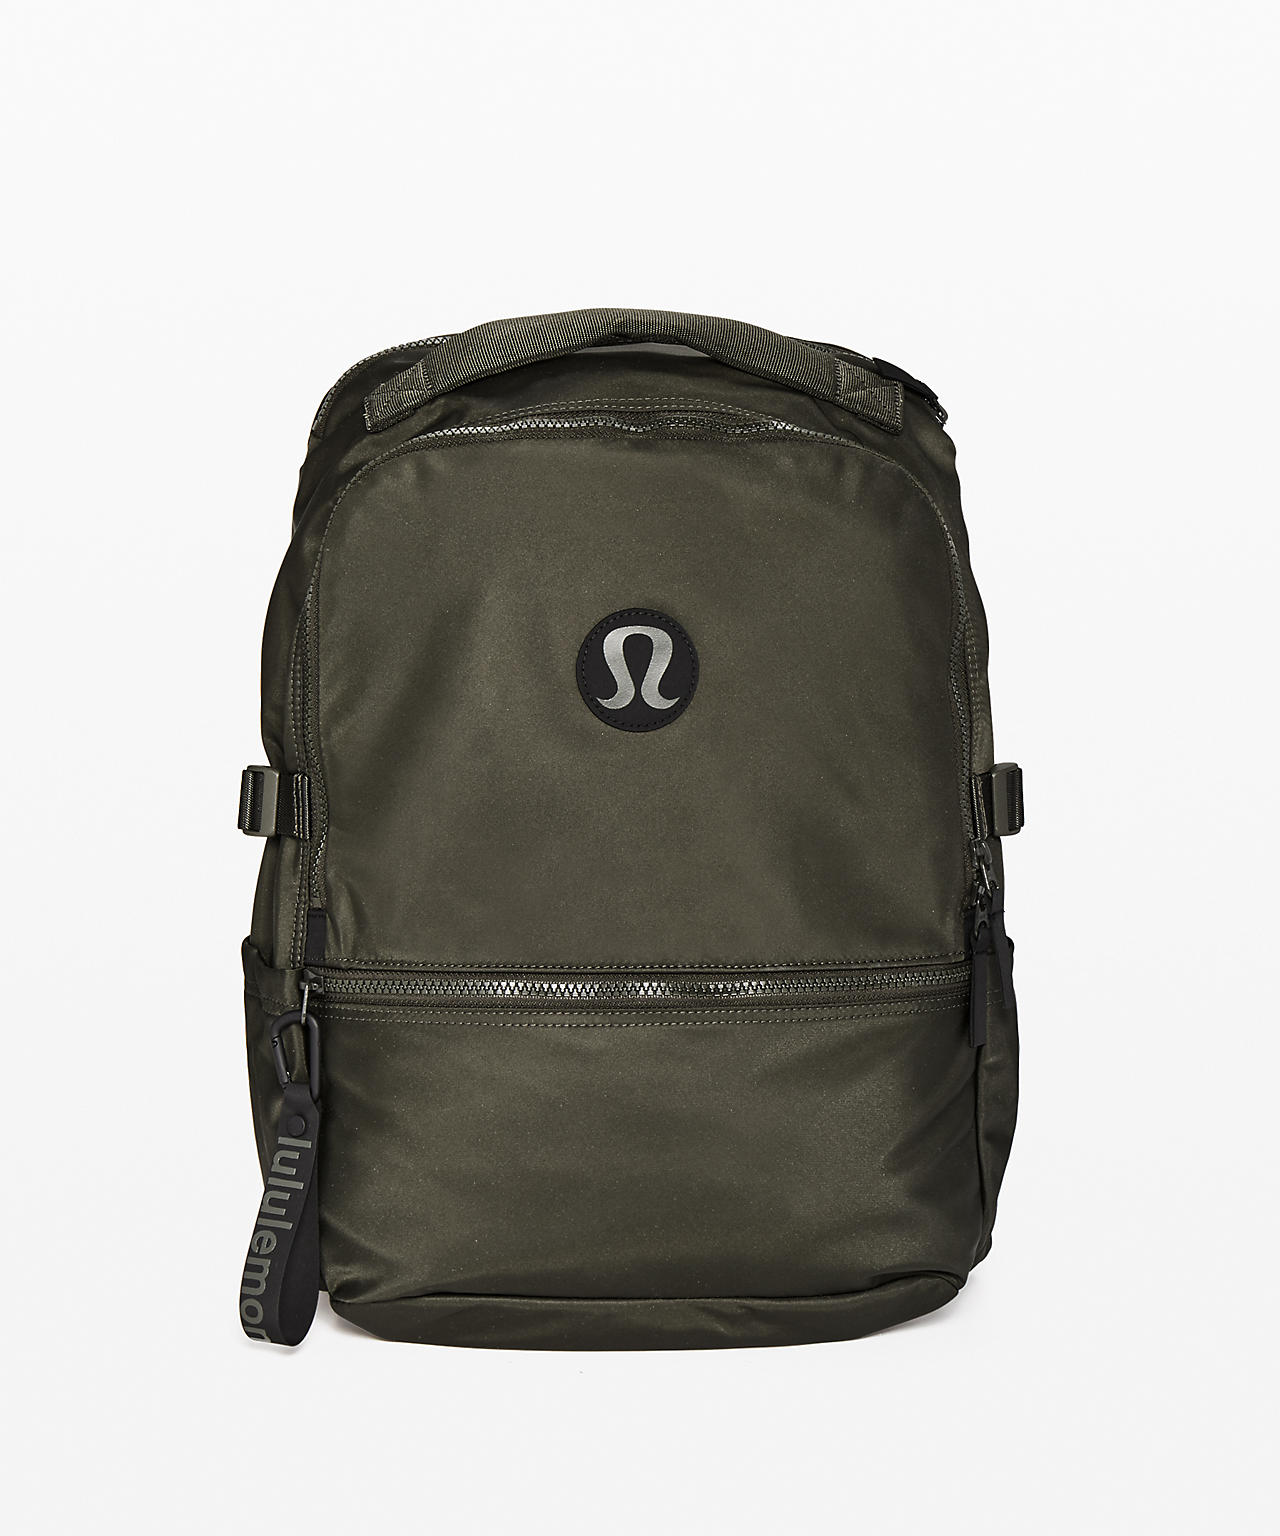 New Crew Backpack, Lululemon Upload